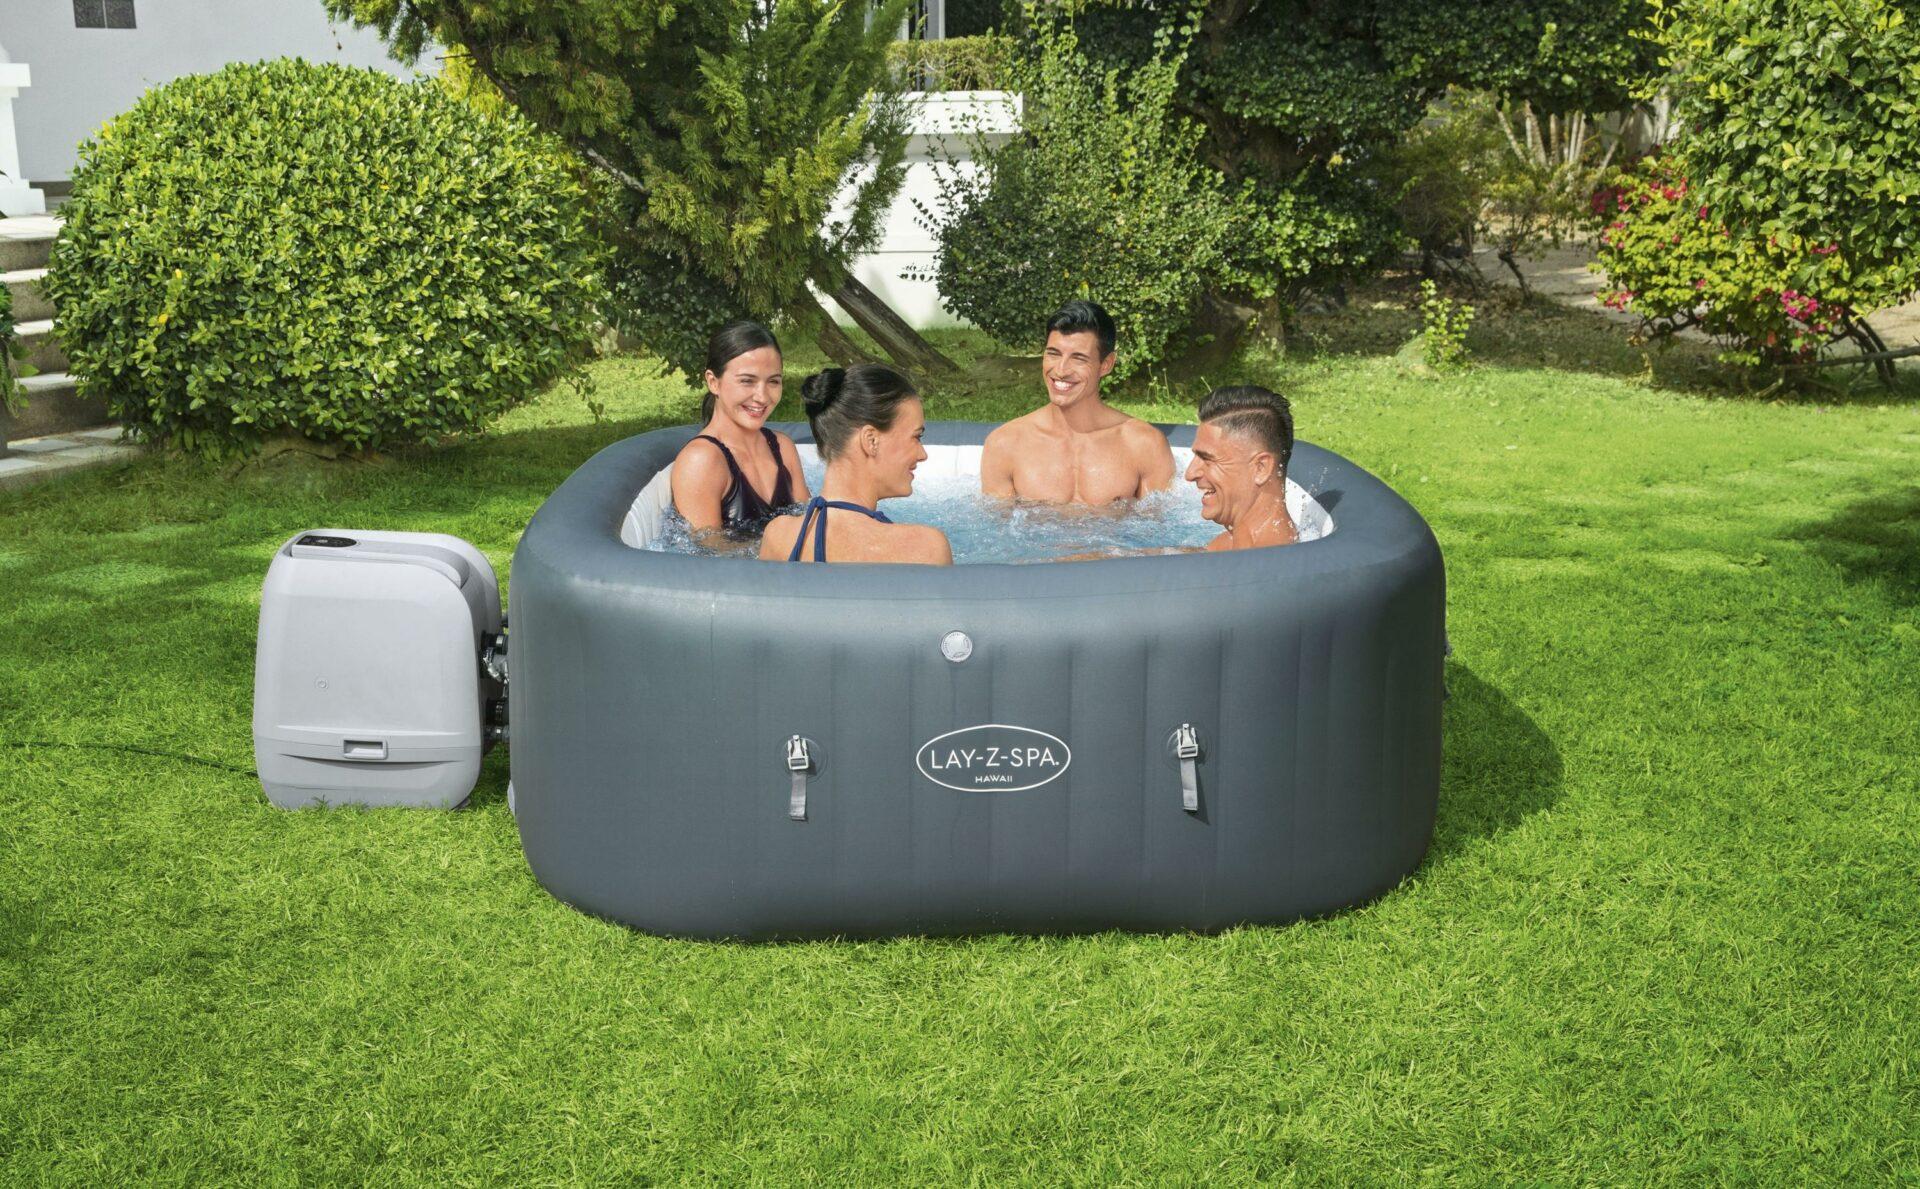 Lay-Z-Spa Hawaii HydroJet pro boblebad